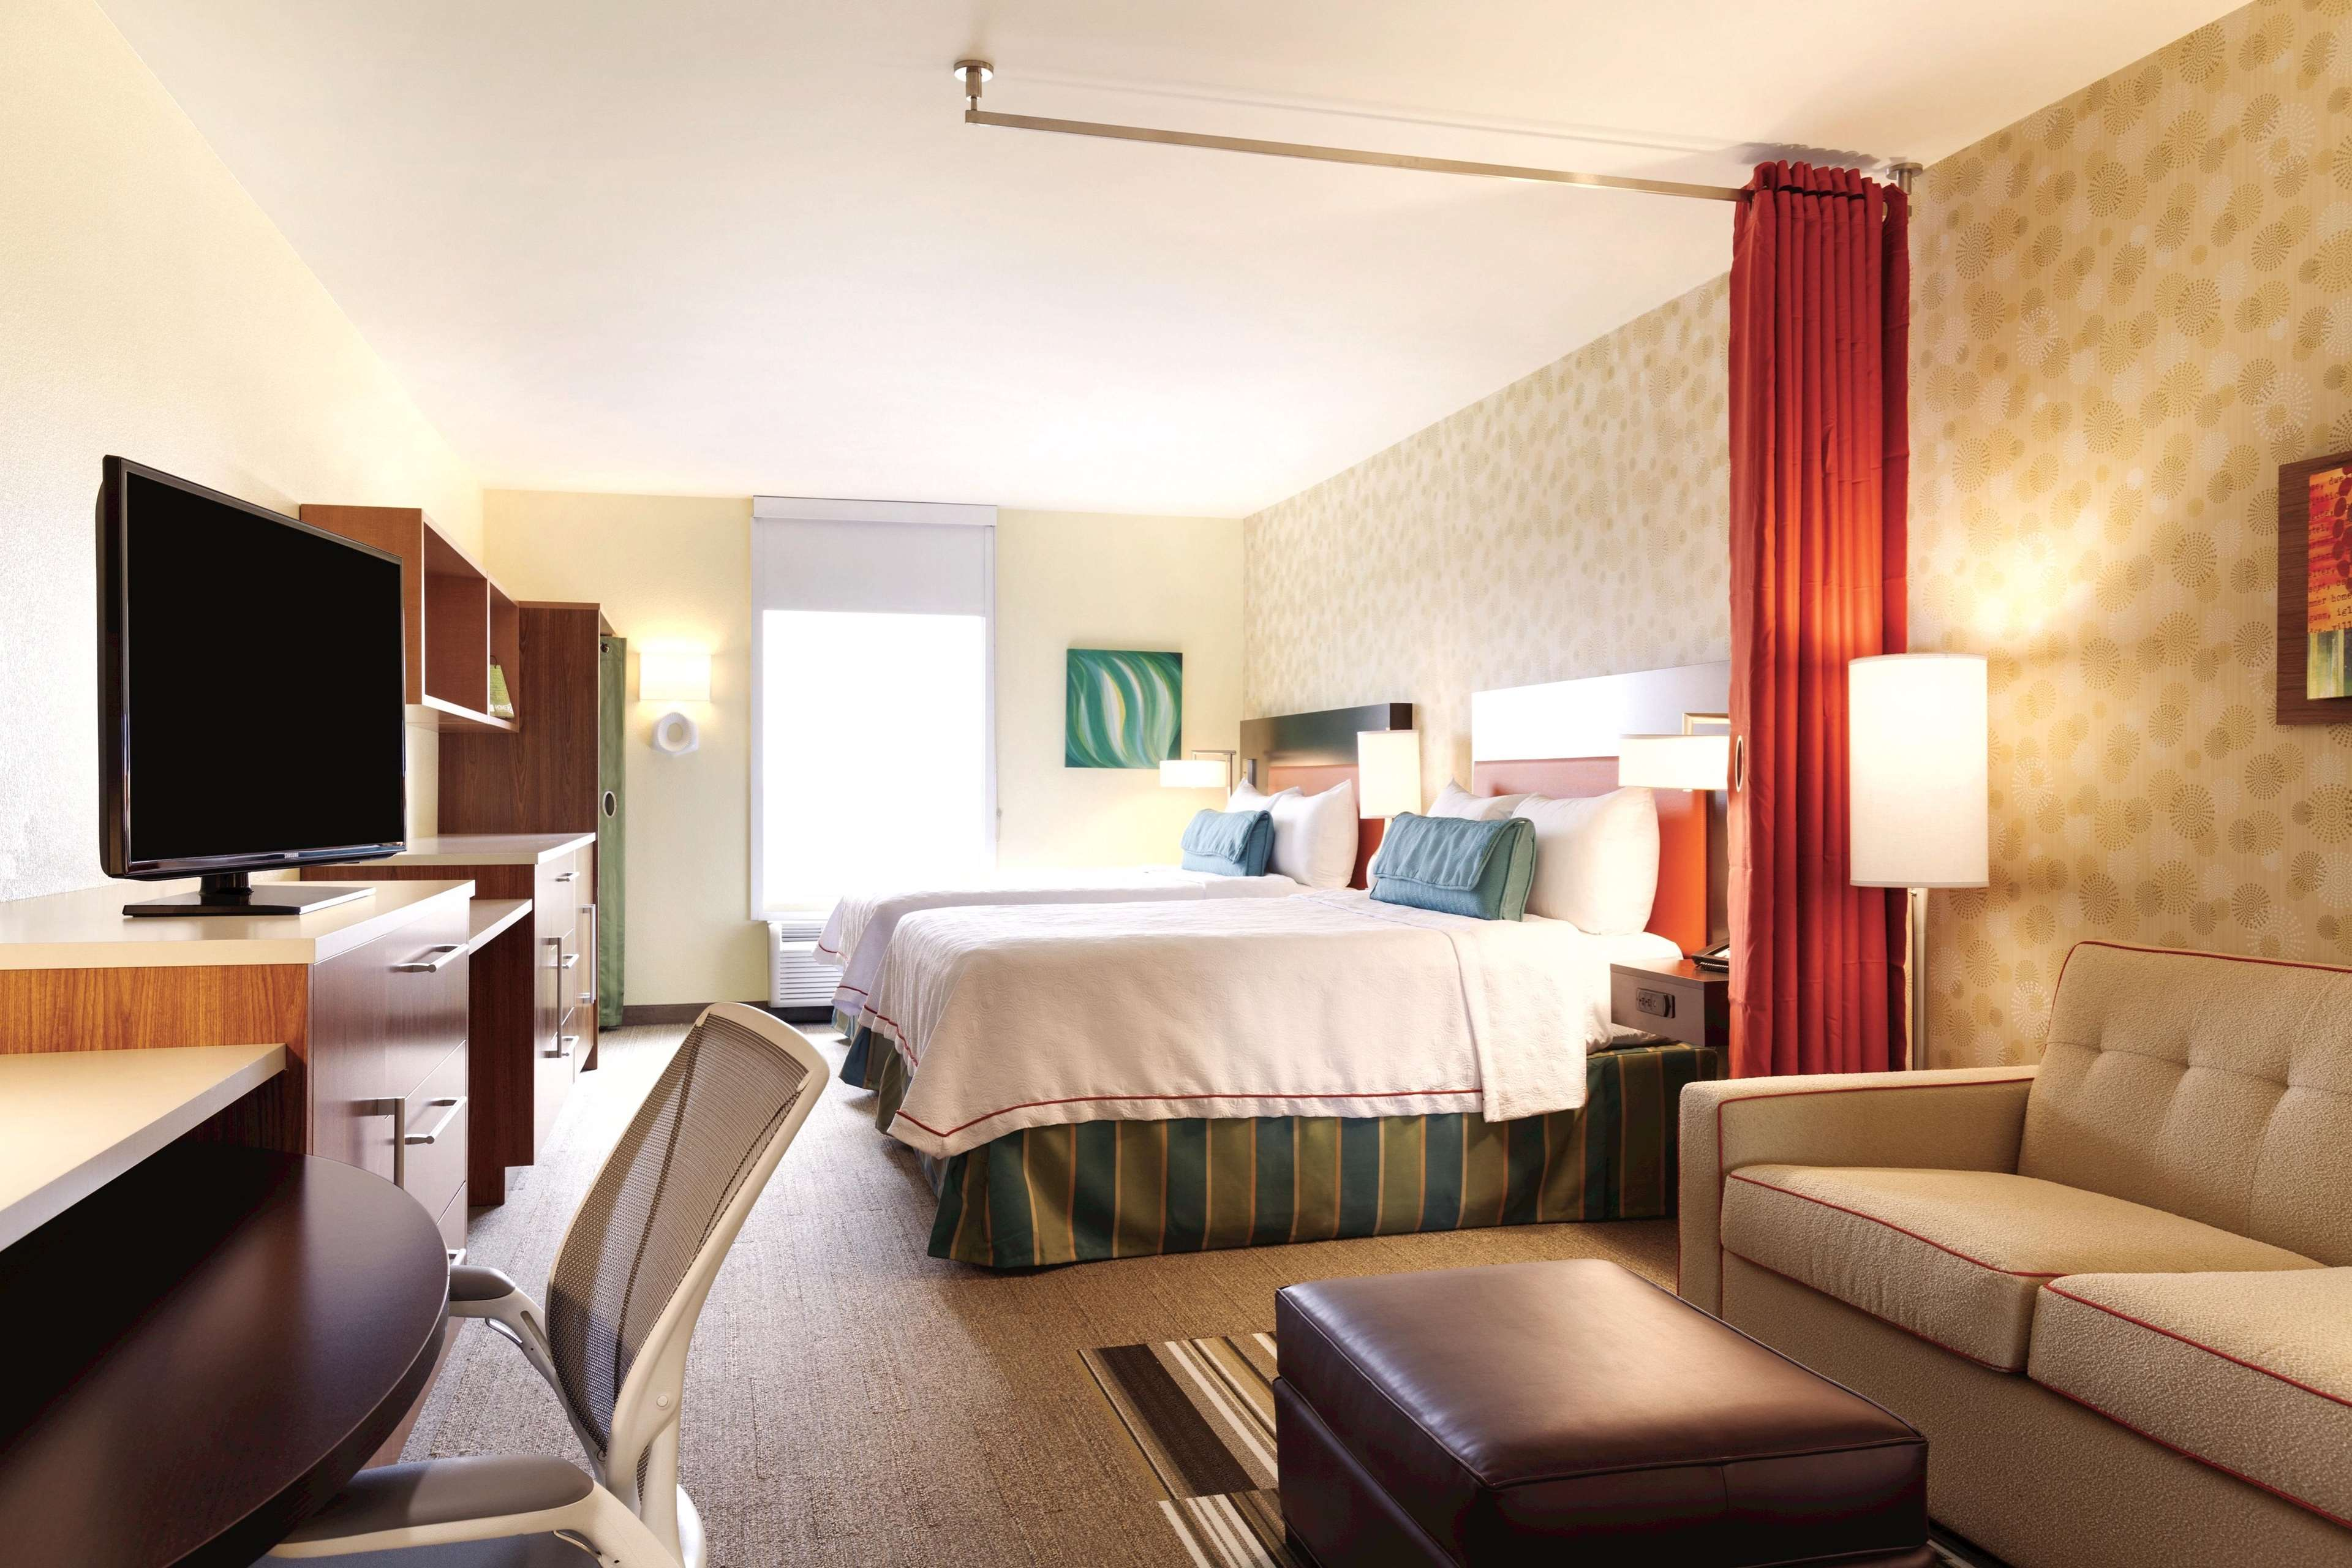 Home2 Suites by Hilton Austin Round Rock image 9